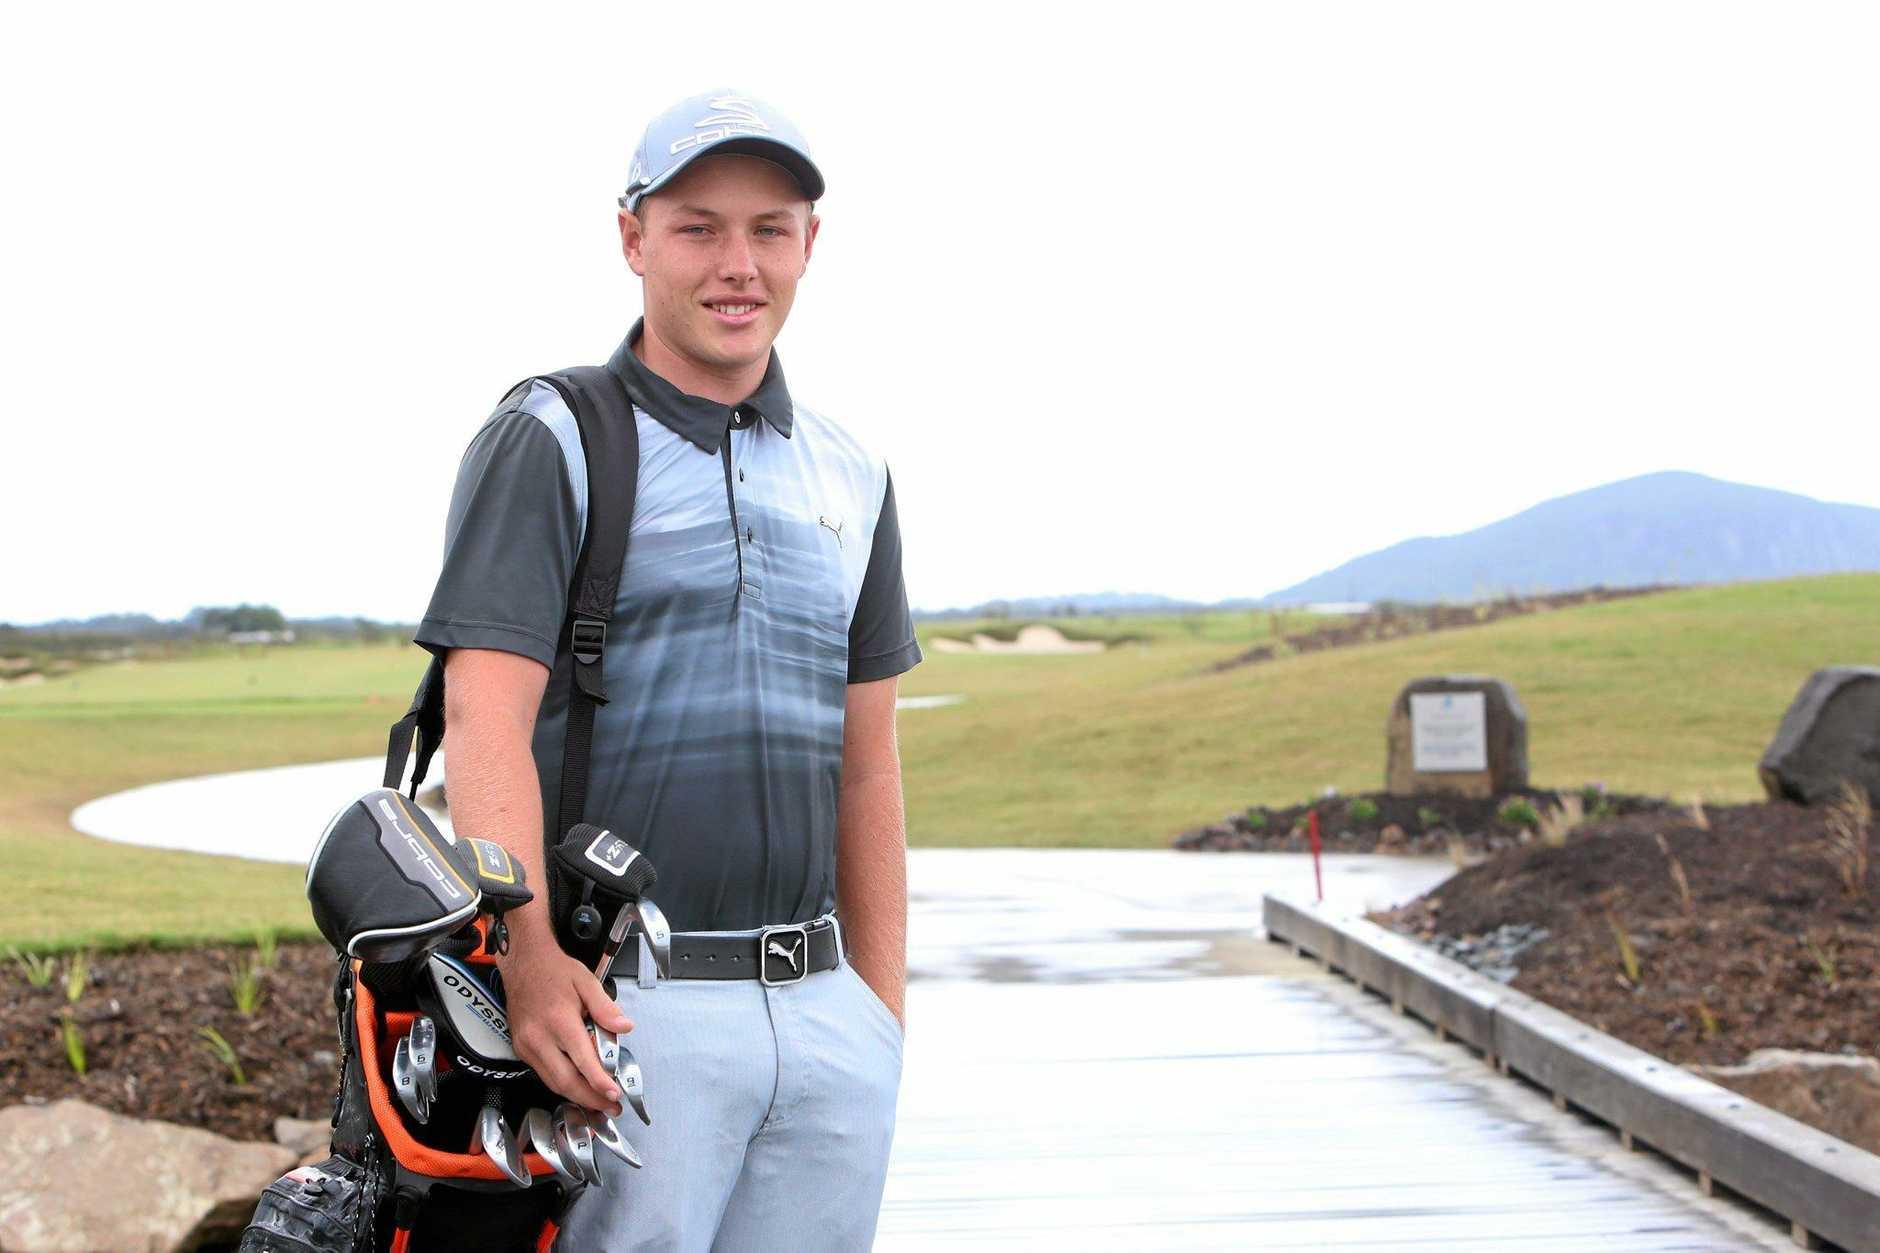 Young golfer Shae Wools - Cobb won a big golf tournment last week. Photo: Nicola Brander / Sunshine Coast Daily